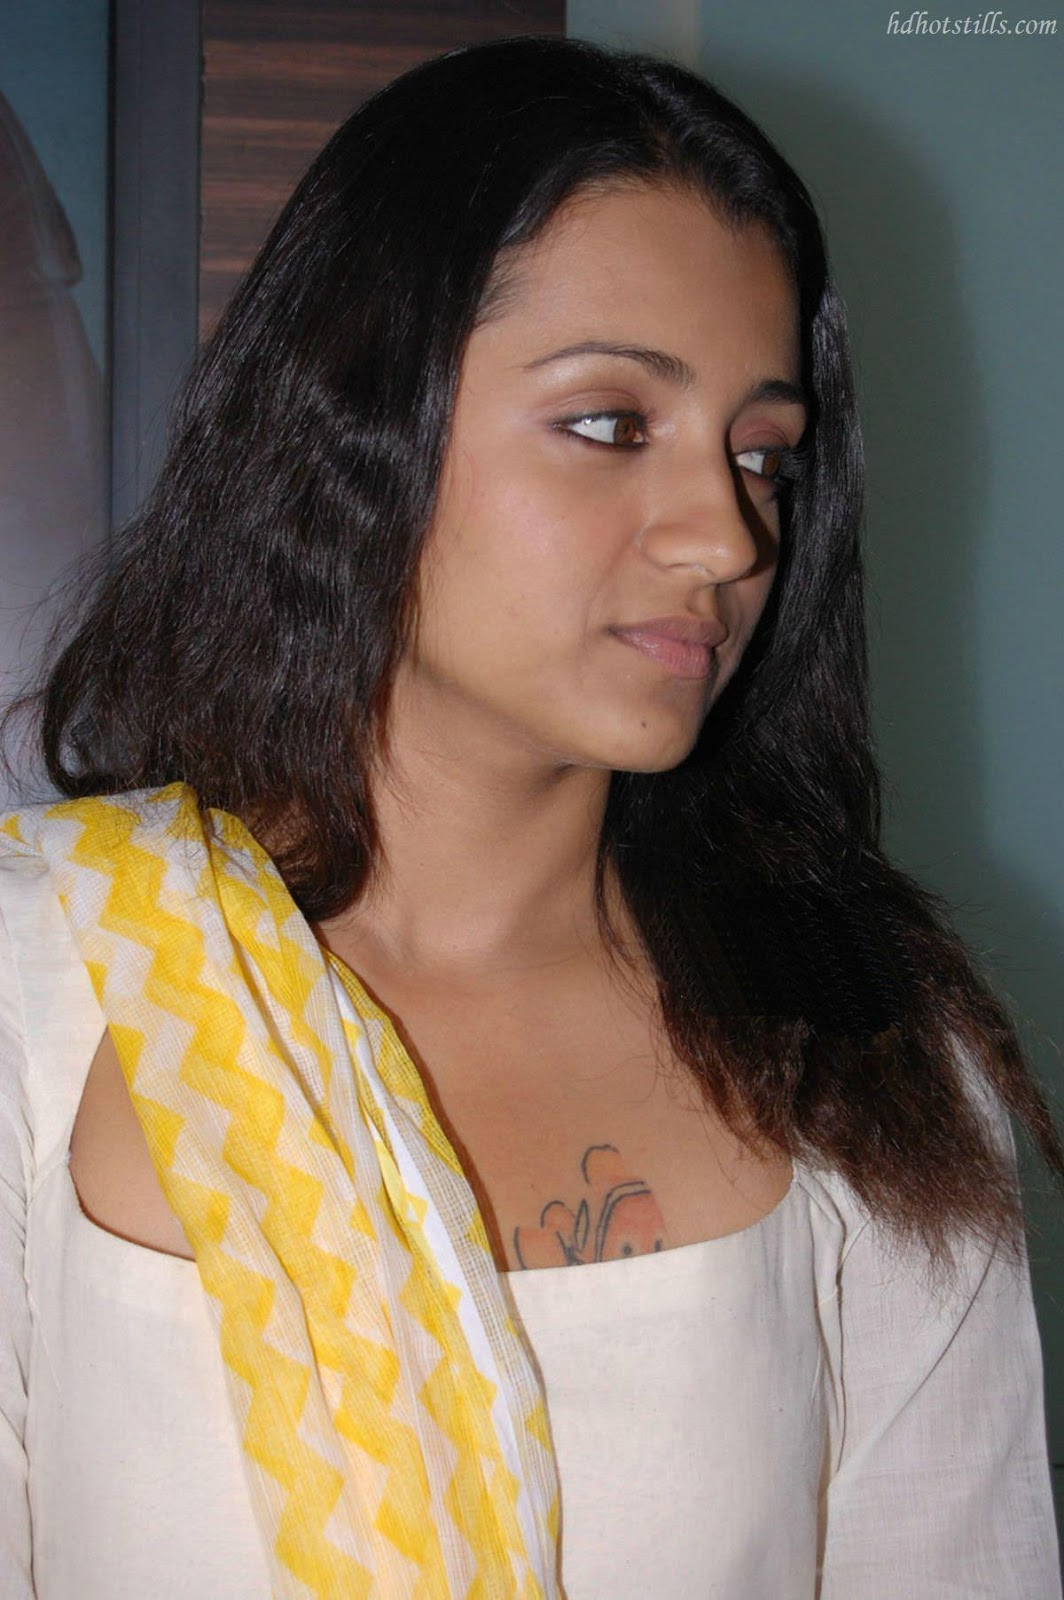 Trisha Cute Smiling Photos and Stills - Indian Actress Wallpapers ...